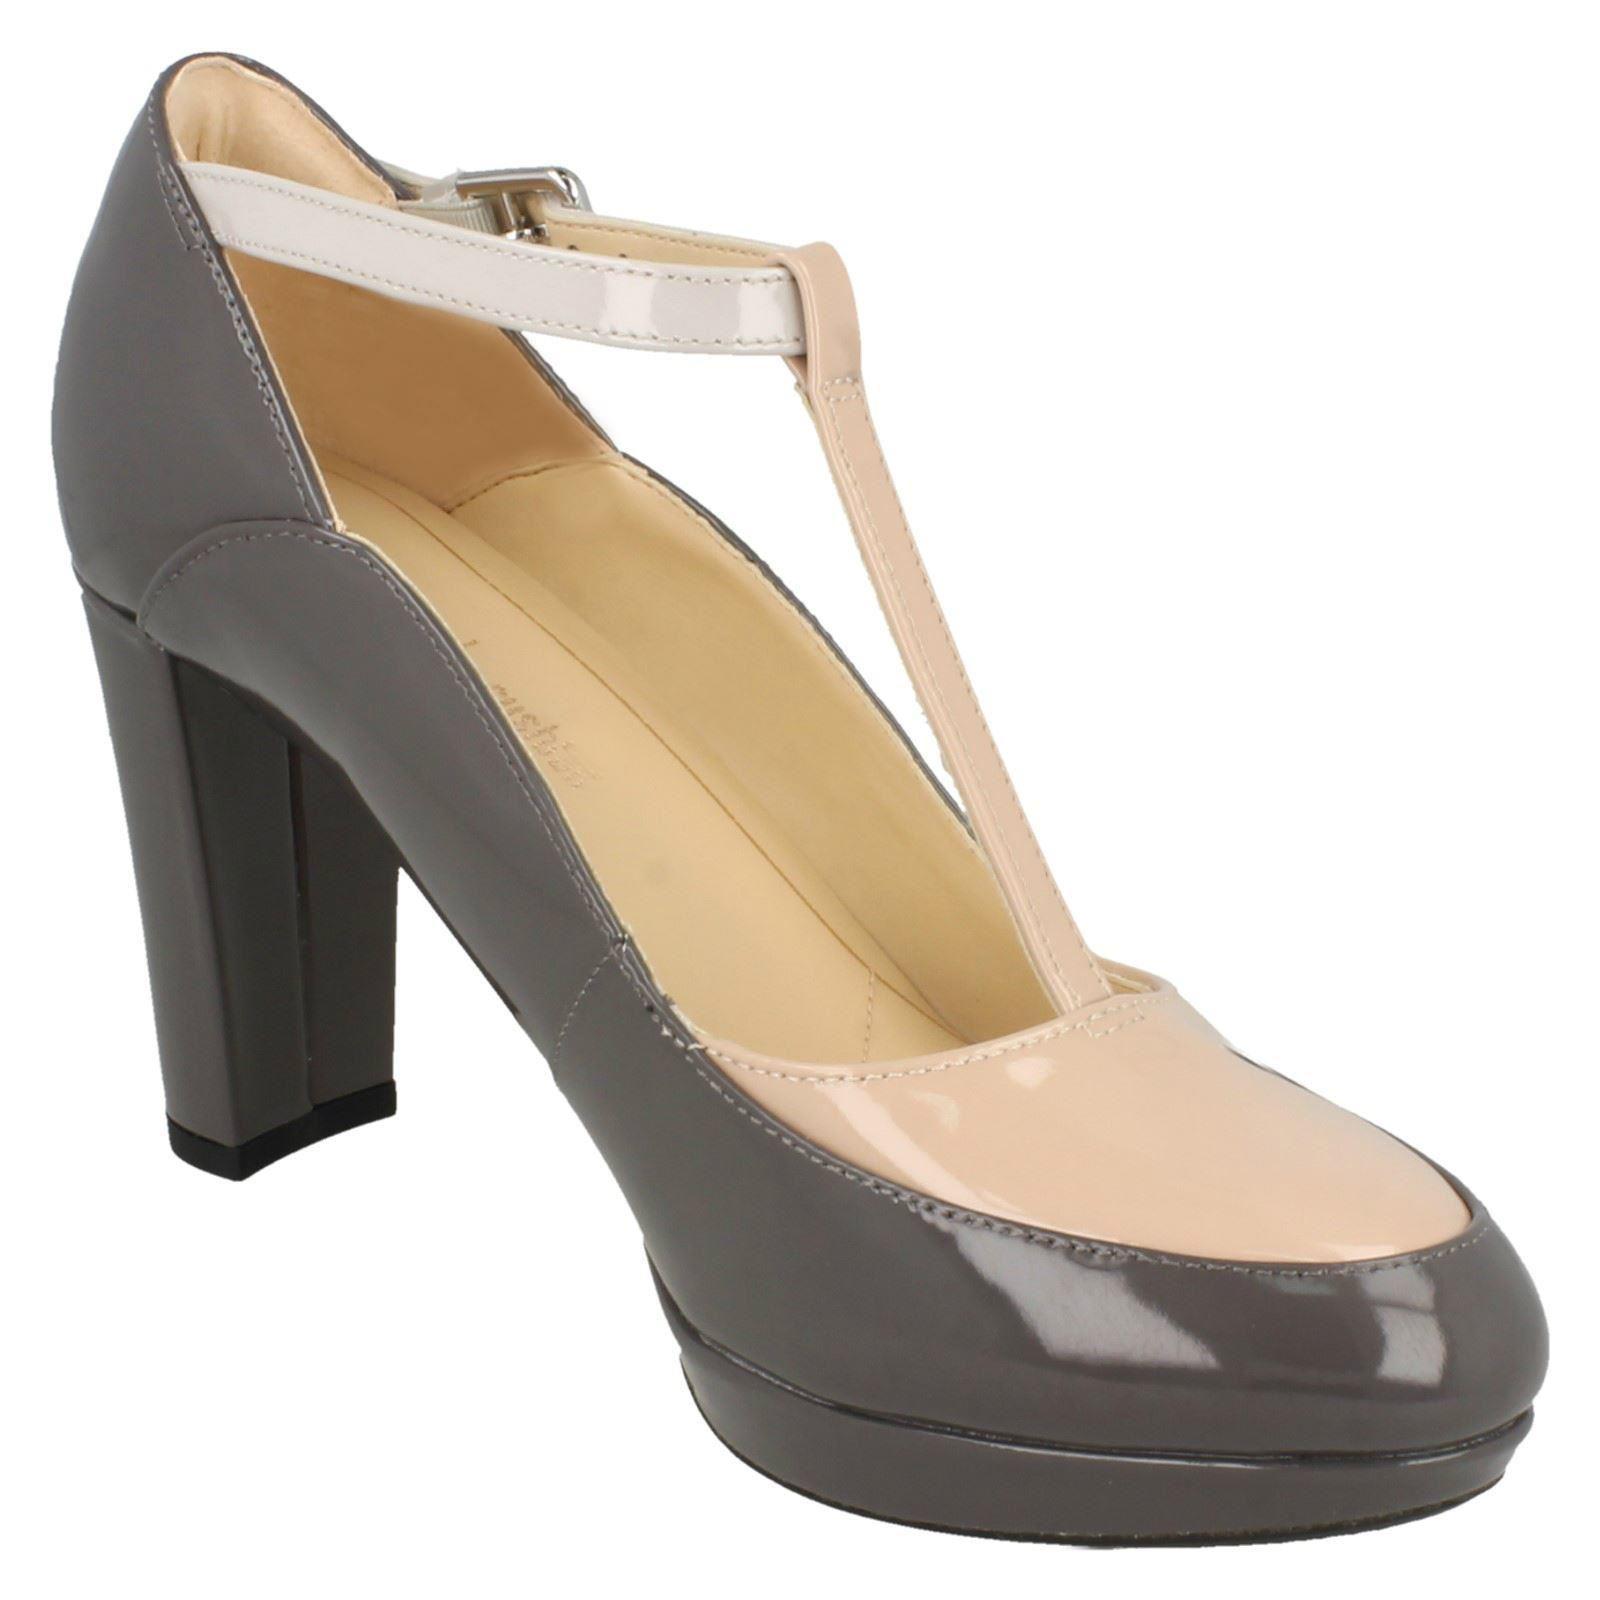 Ladies Clarks T-Bar Block Heel Smart Court Shoes Kendra Daisy